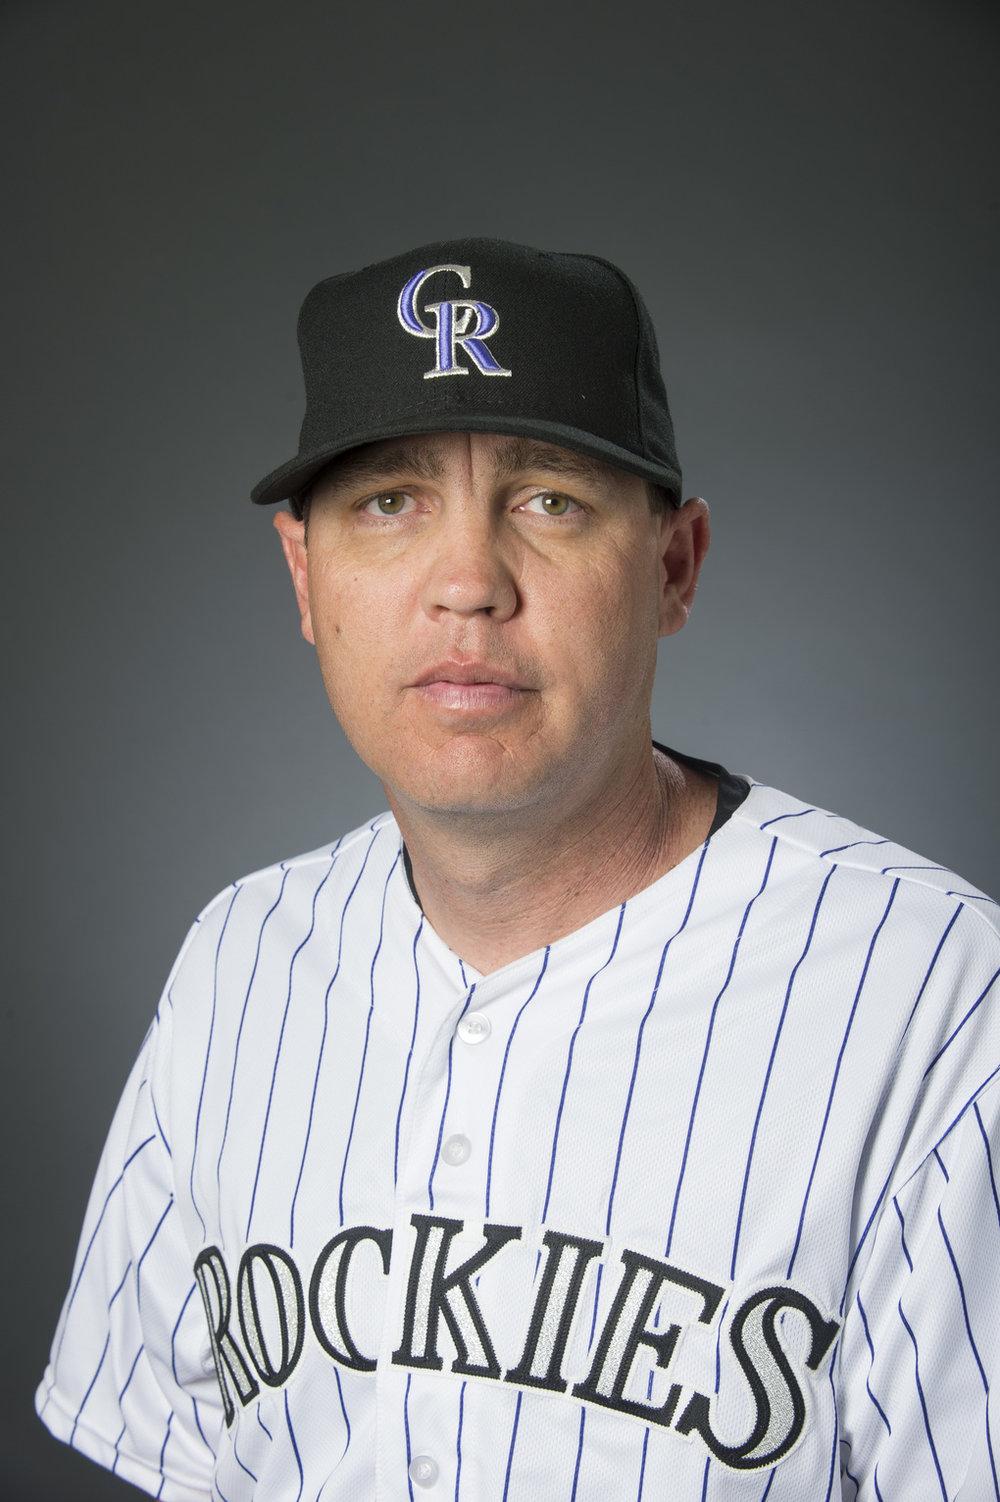 Andy McKay - MLB Rockies